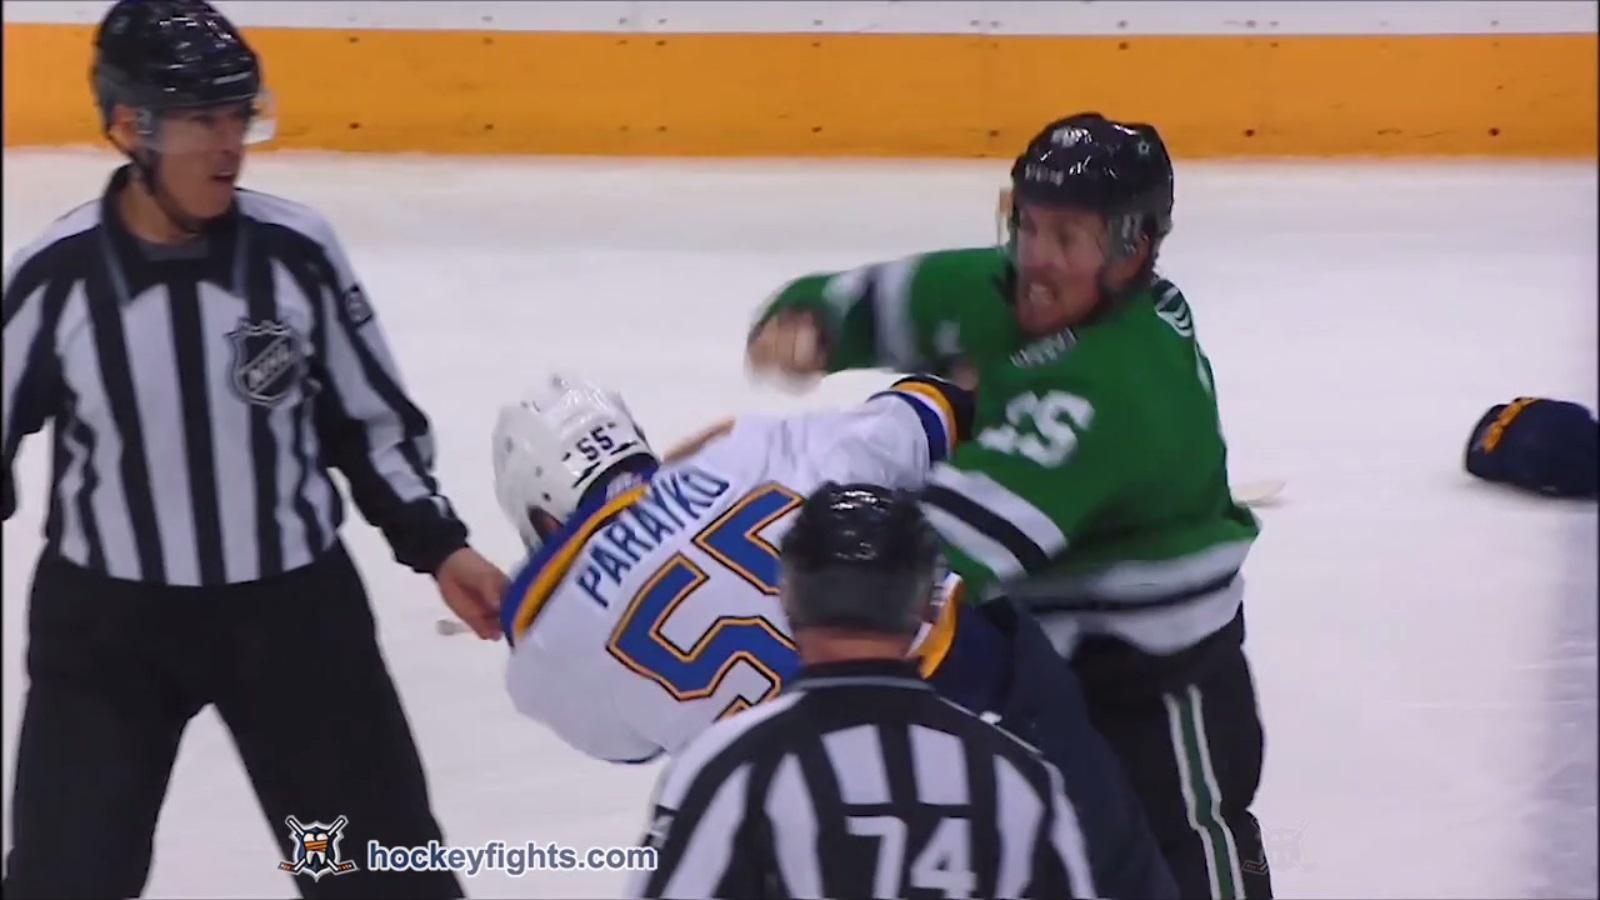 Brett Ritchie vs. Colton Parayko